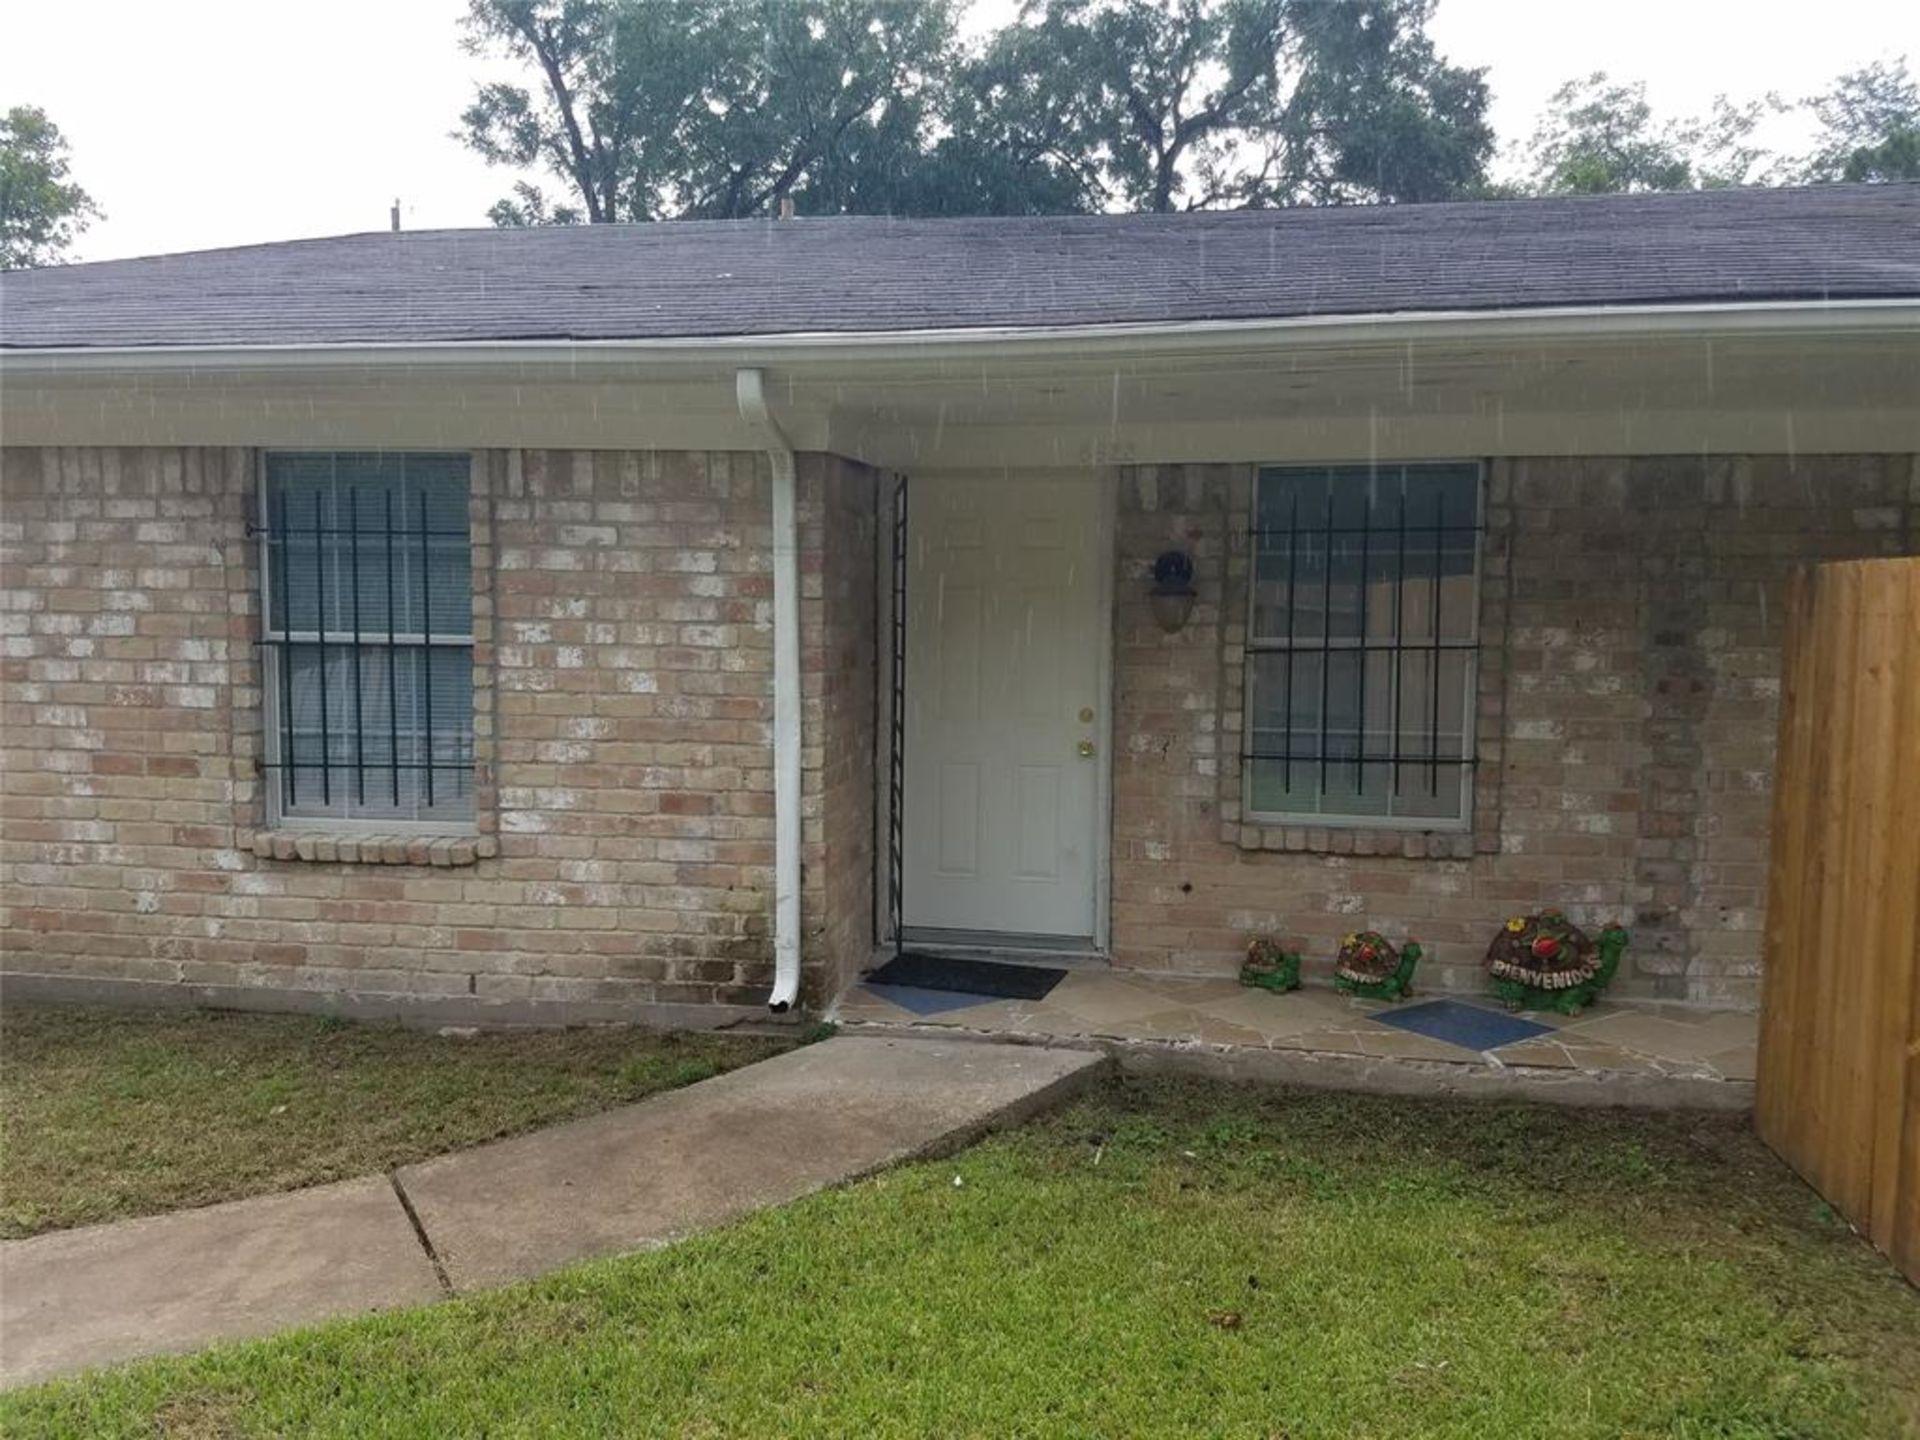 The Investors Dream***SPECIAL FINANCING***: 8622 Elbert St. Houston TX 77028